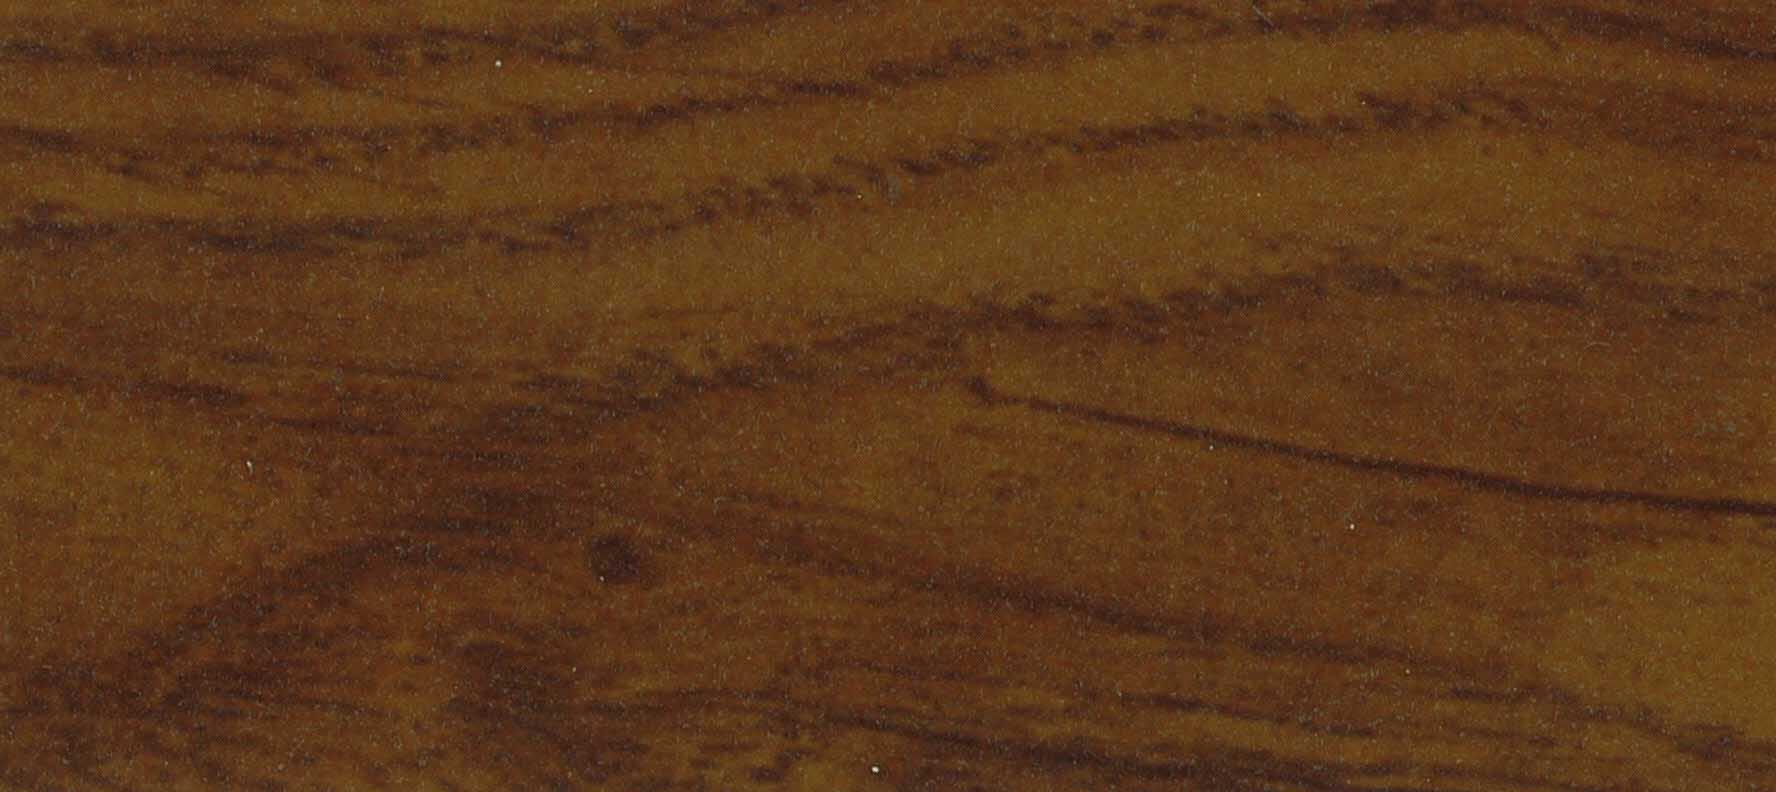 maderas sublimación S_010 - EMBERO TEXTURADO